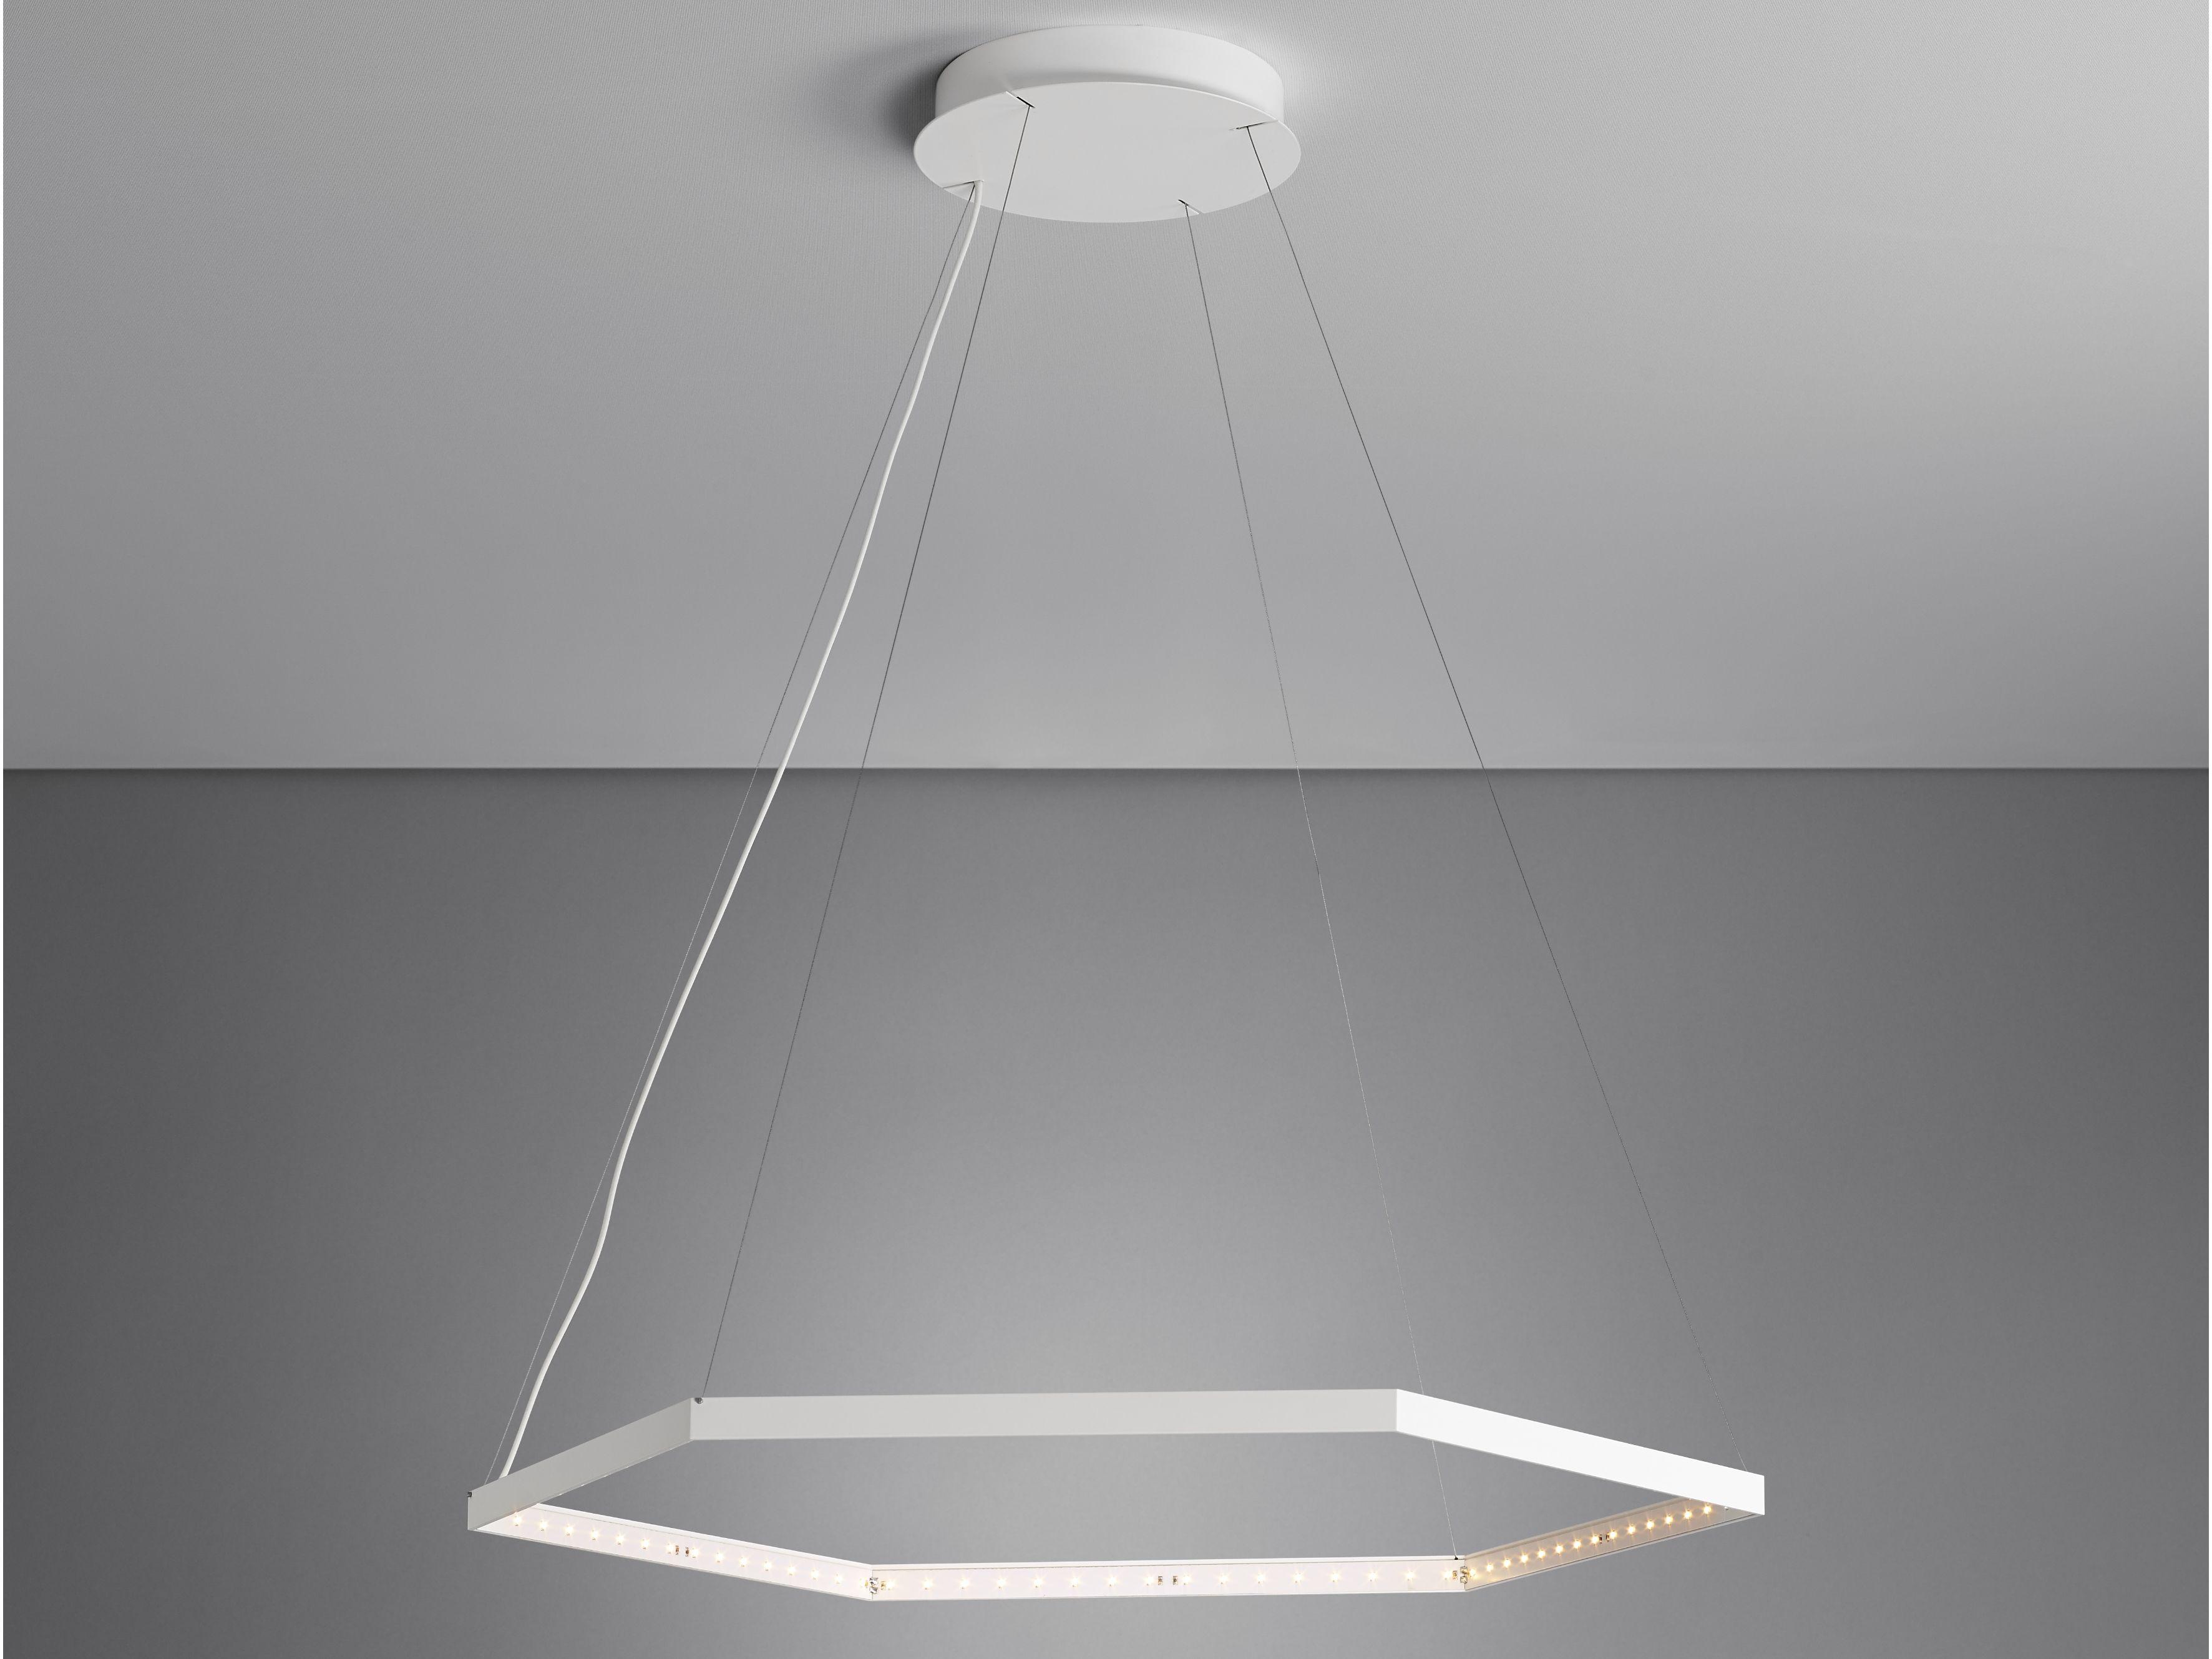 Led Direct Light Indirect Light Steel Pendant Lamp Hexa 1 By Le Deun Luminaires Pendant Lamp Lamp Acrylic Chandelier